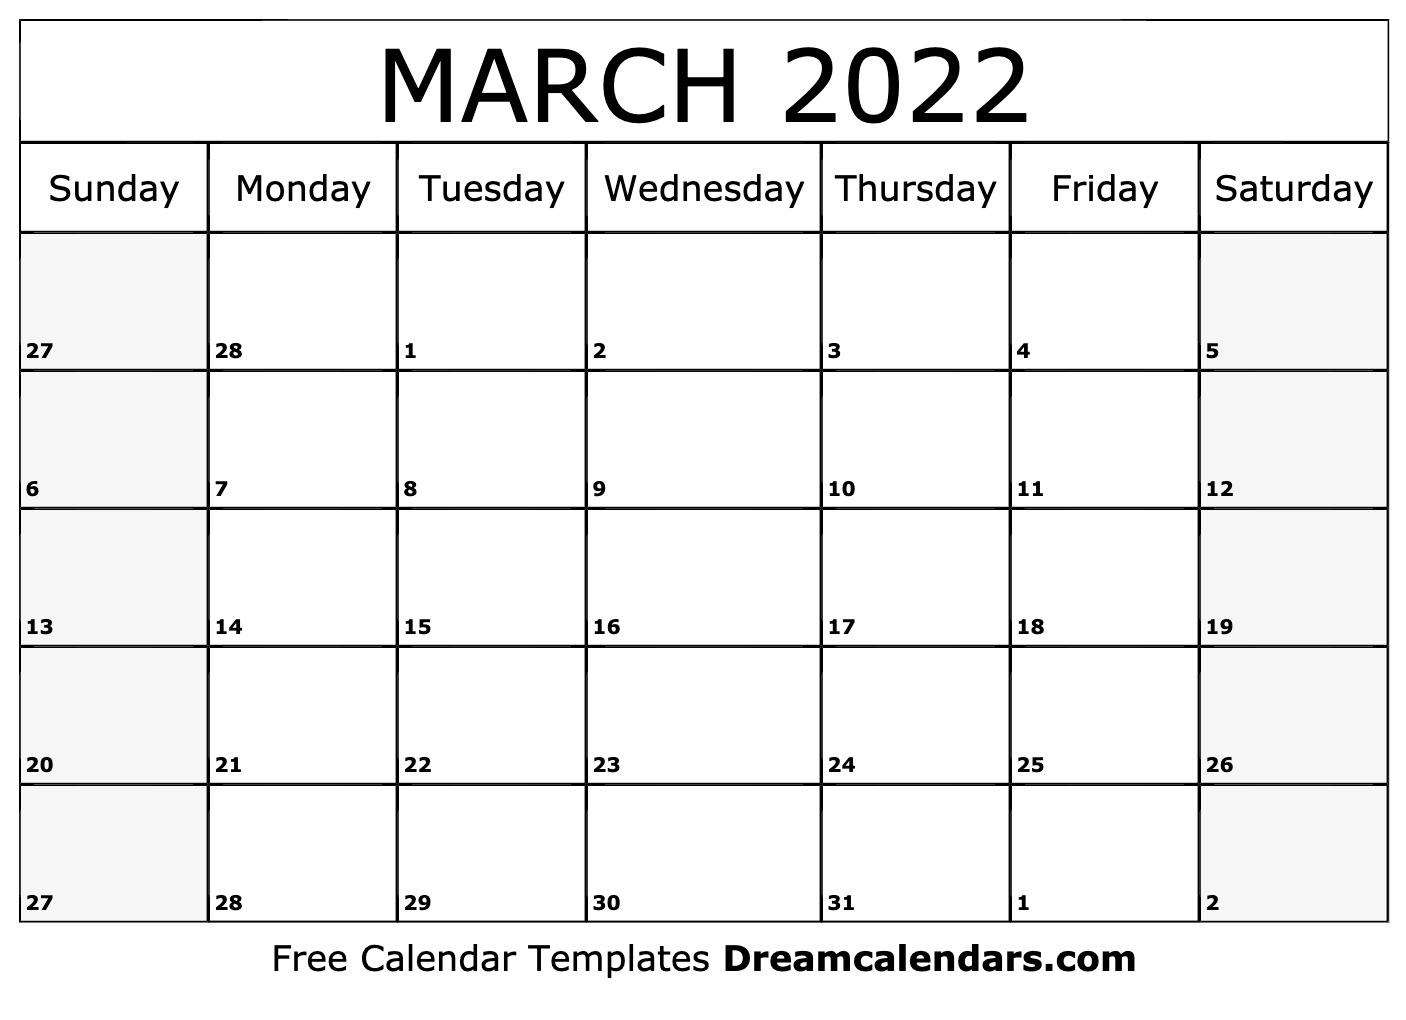 March 2022 Holiday Calendar.March 2022 Calendar Free Blank Printable Templates